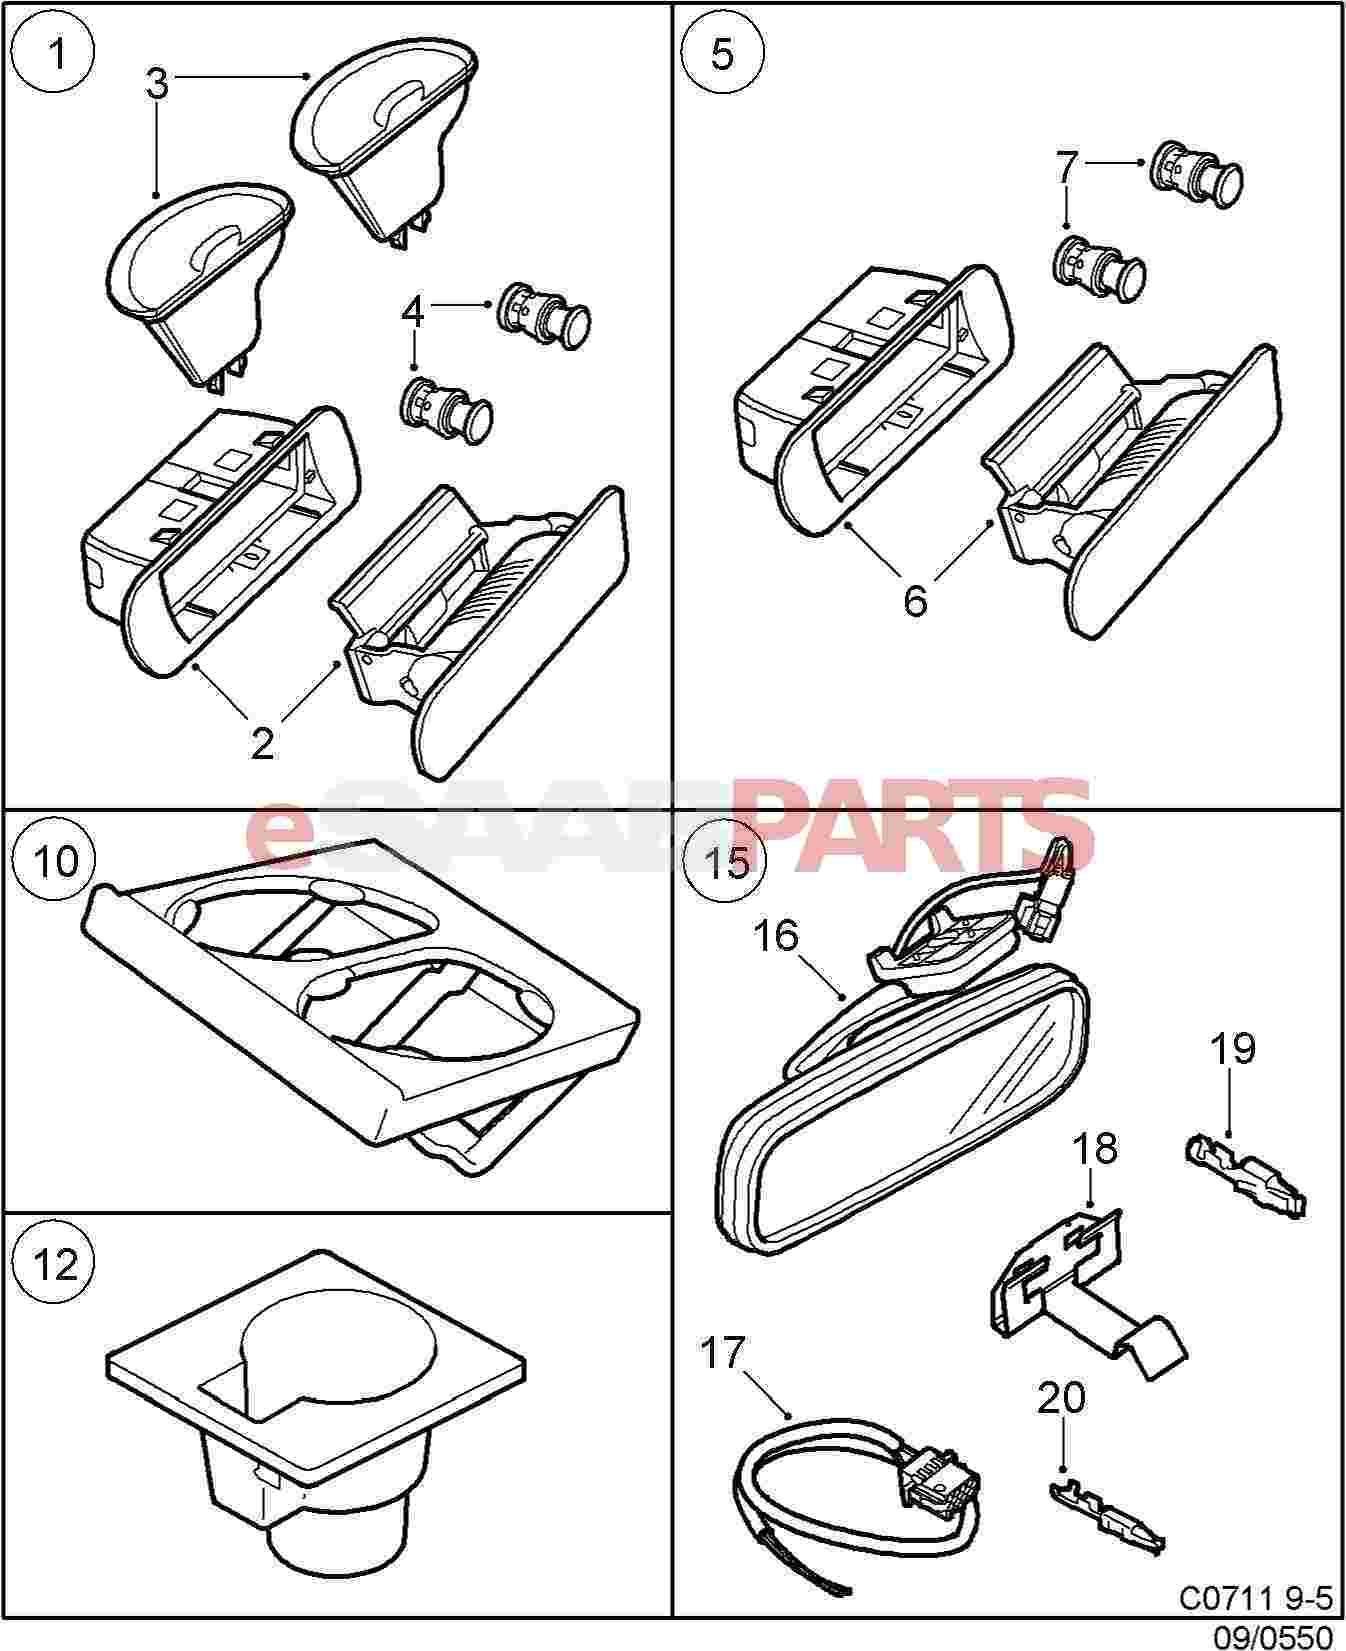 saab 9 3 mirror wiring diagram saab 9 3 ac wiring diagram [12777851] saab auto-dimming rear view mirror (w/o garage ... #7